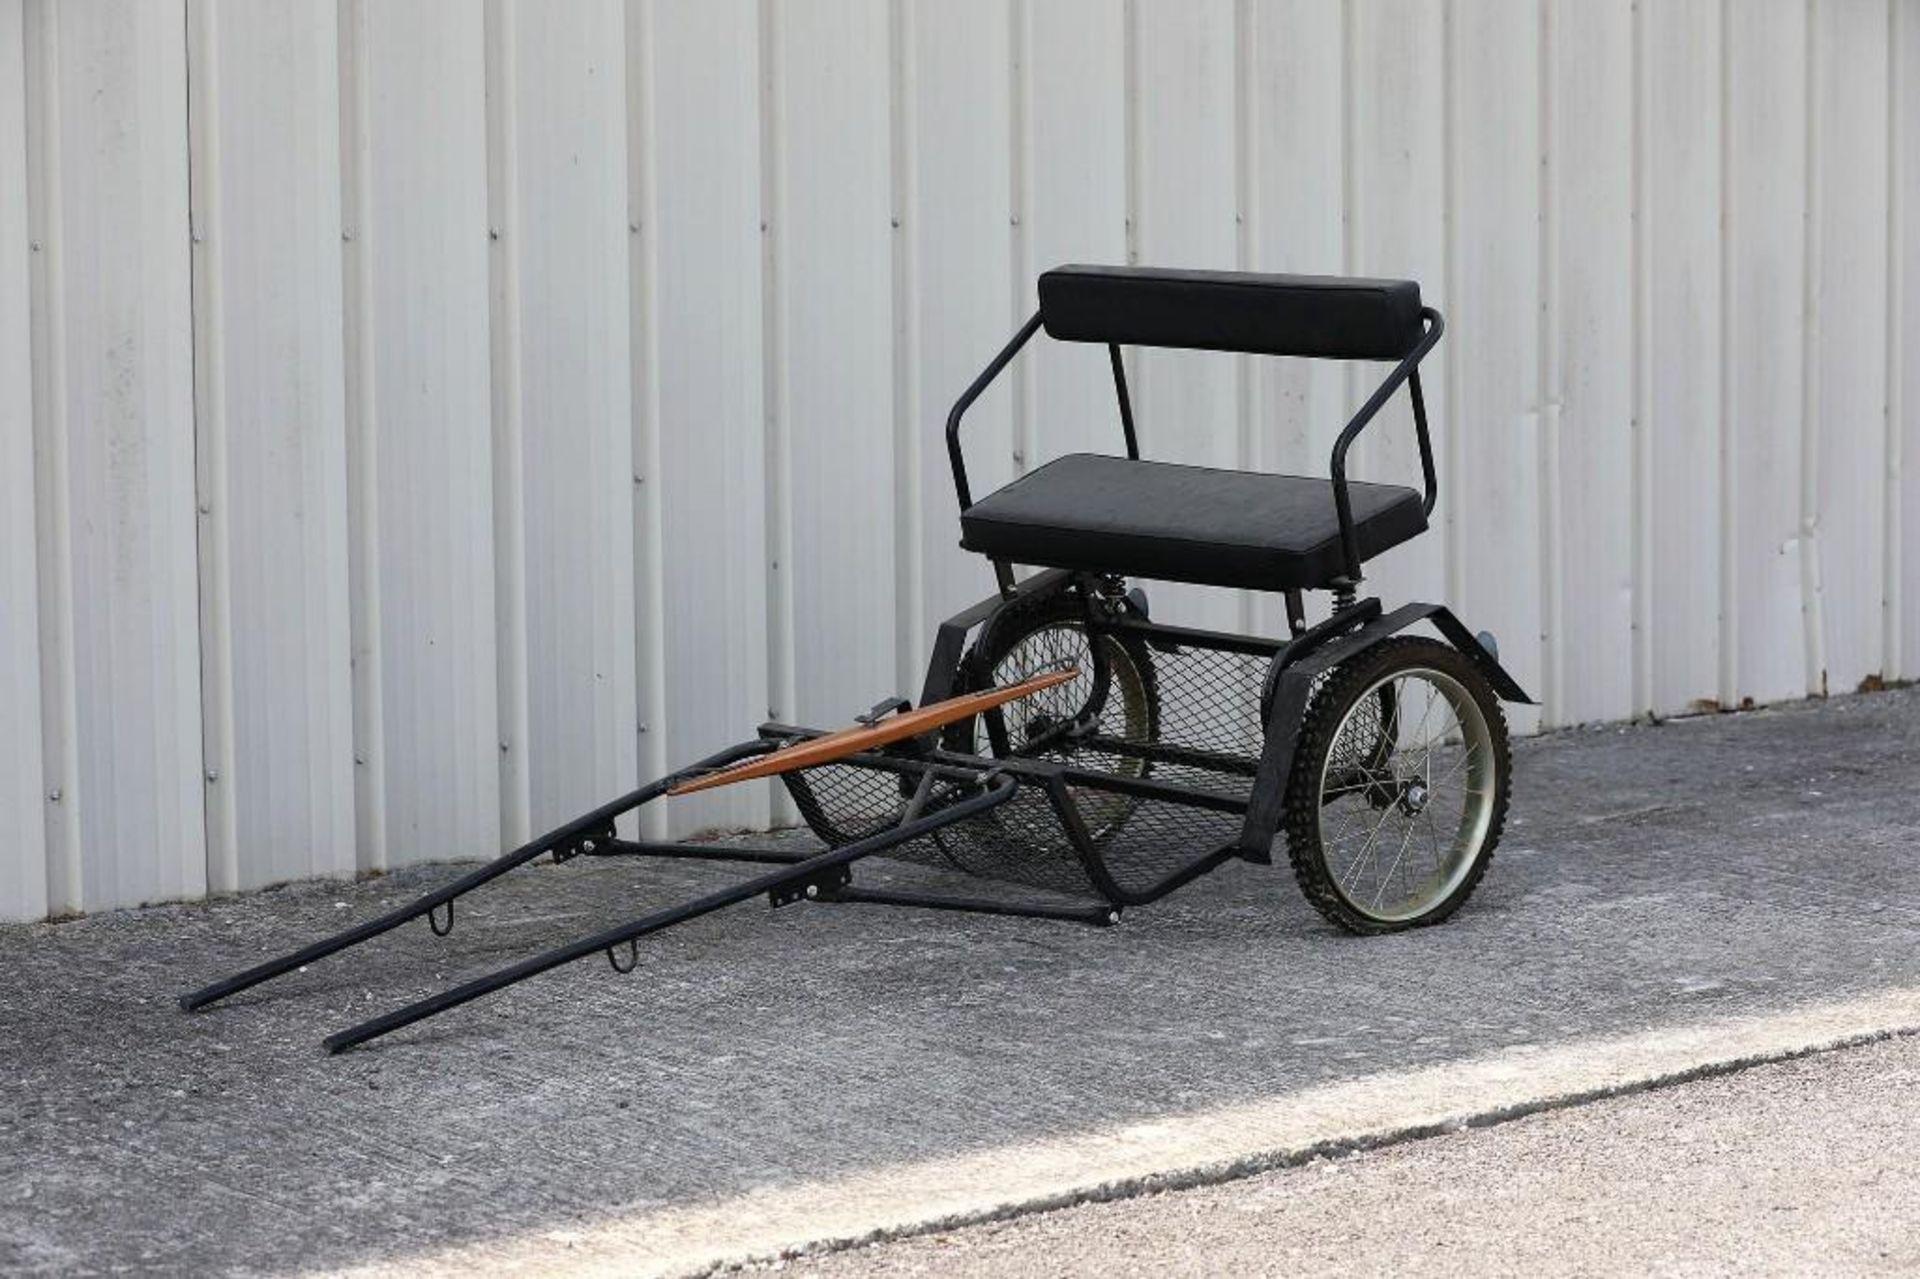 2-Wheel Pony Cart - Image 2 of 2